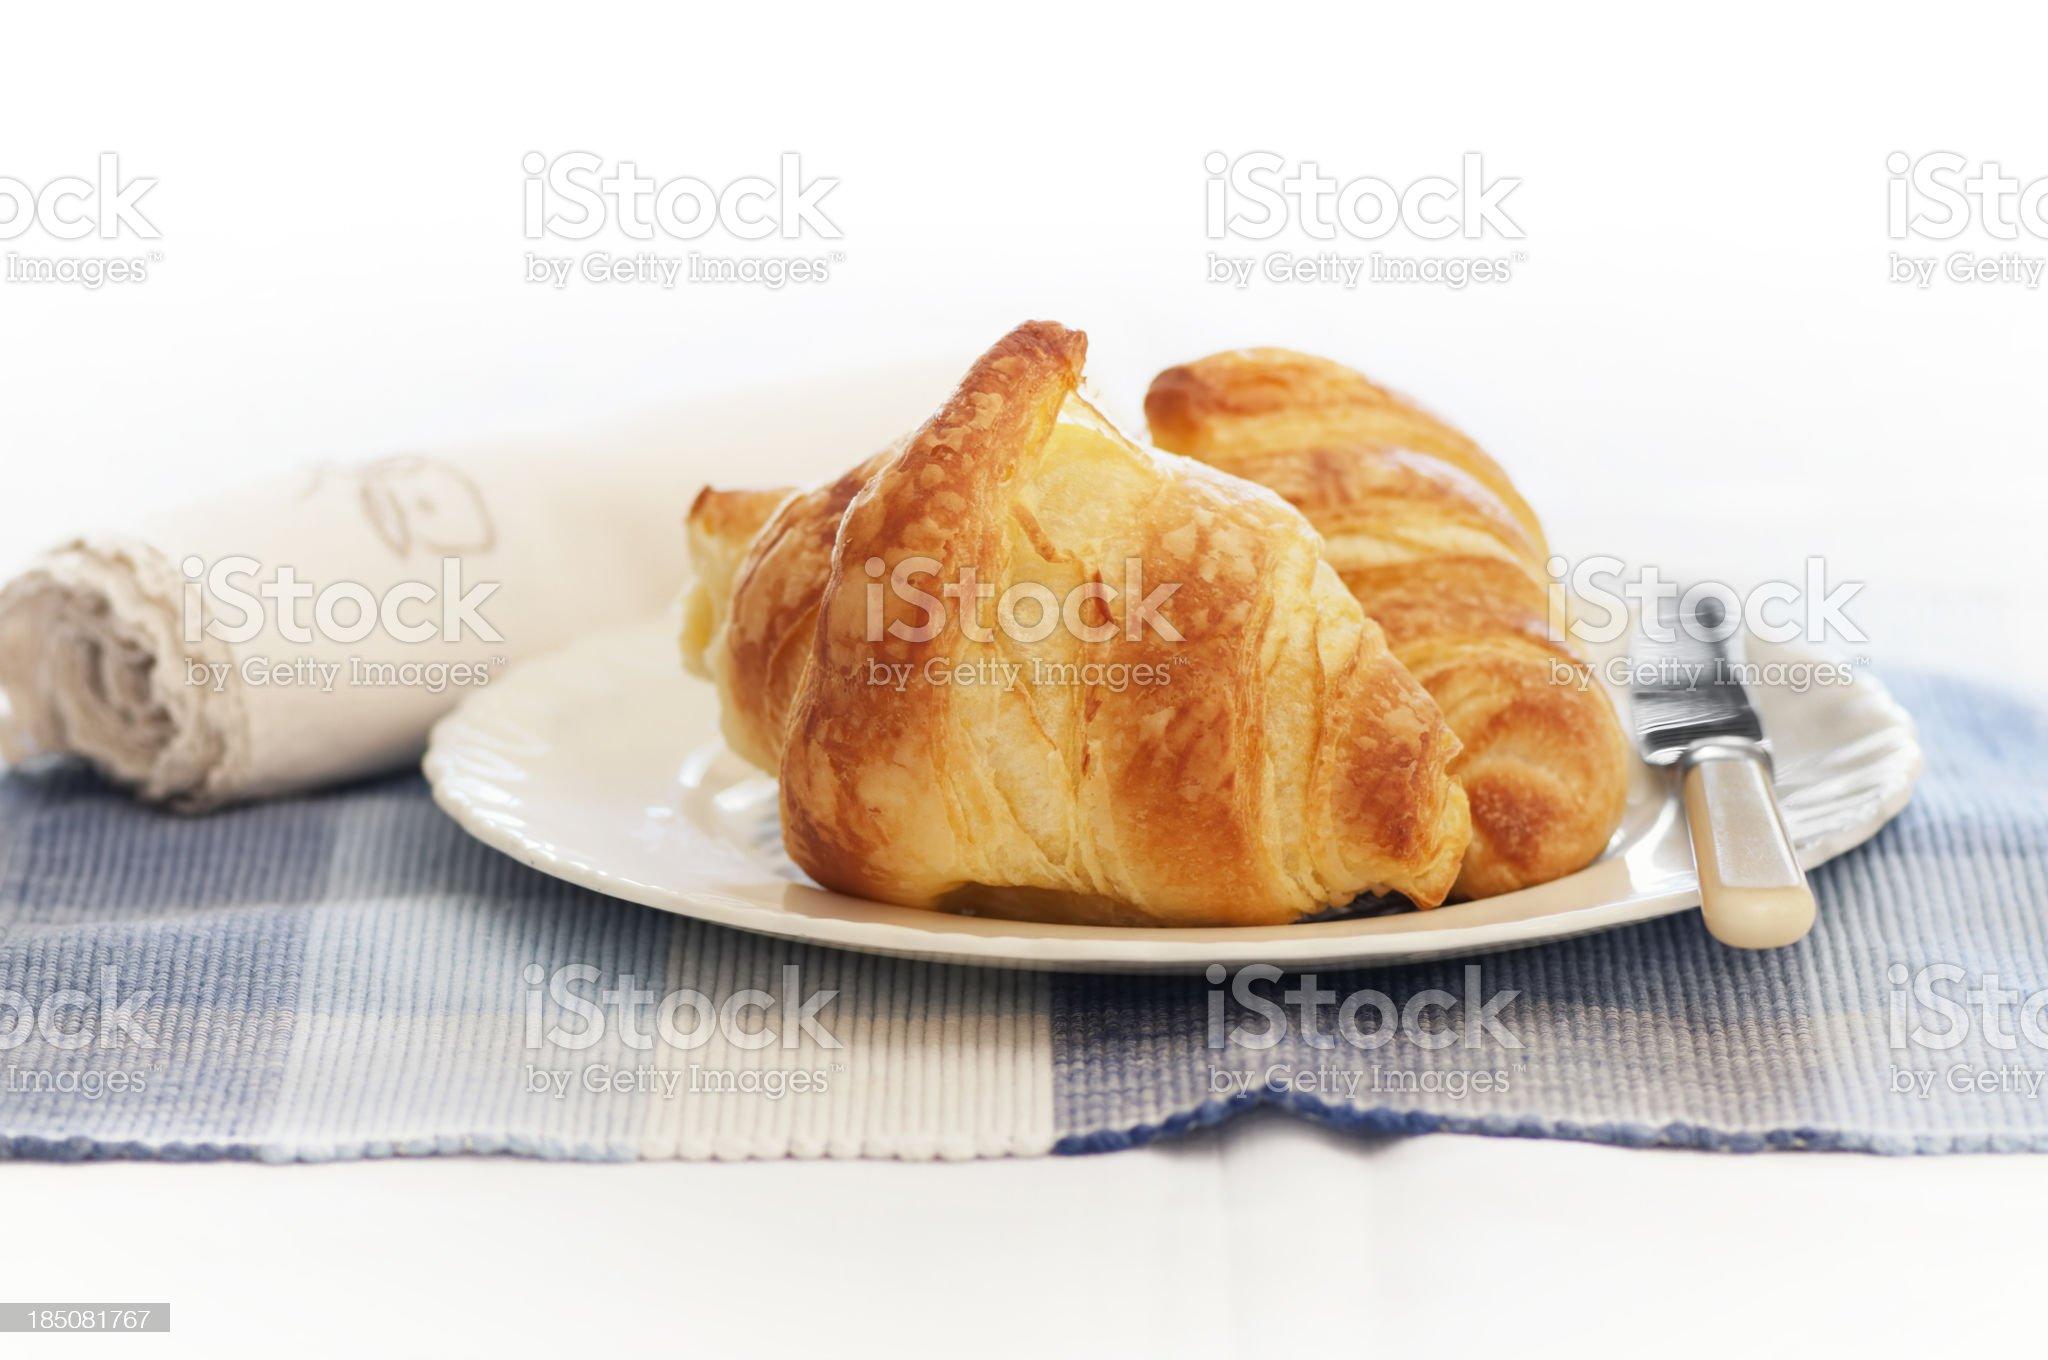 Croissant breakfast royalty-free stock photo